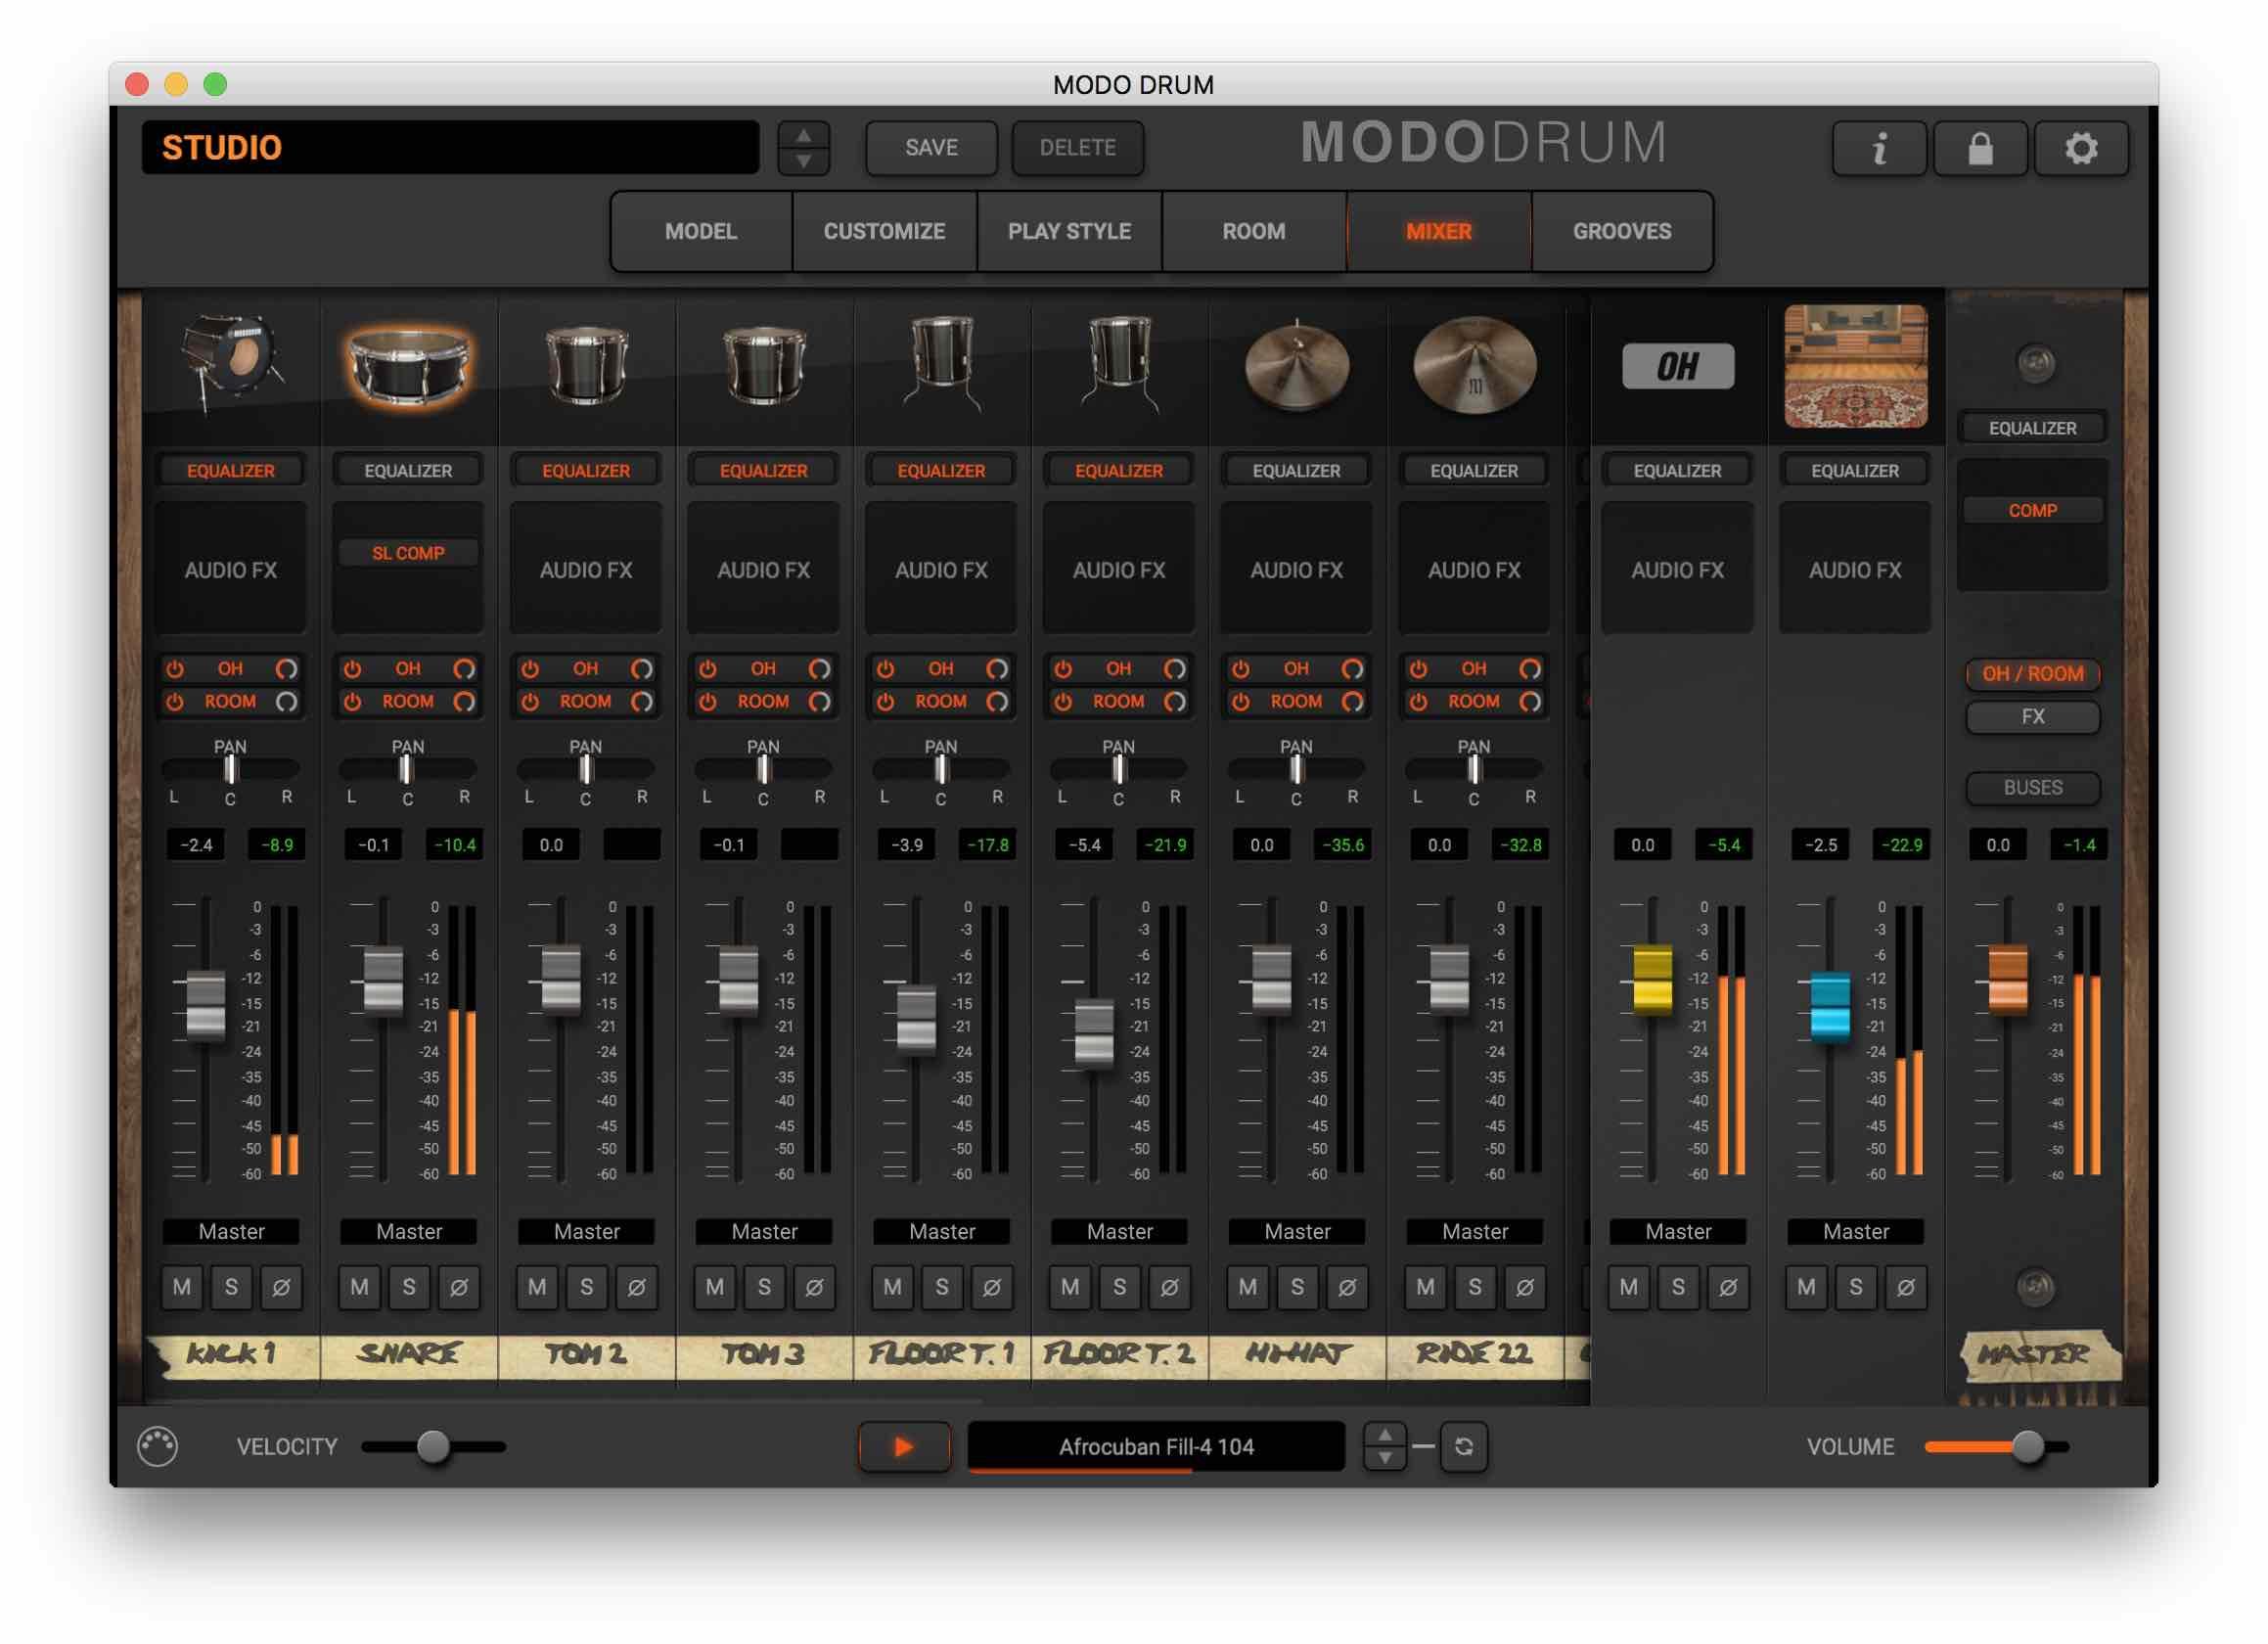 IK-Multimedia-MODO-DRUM-Mixer